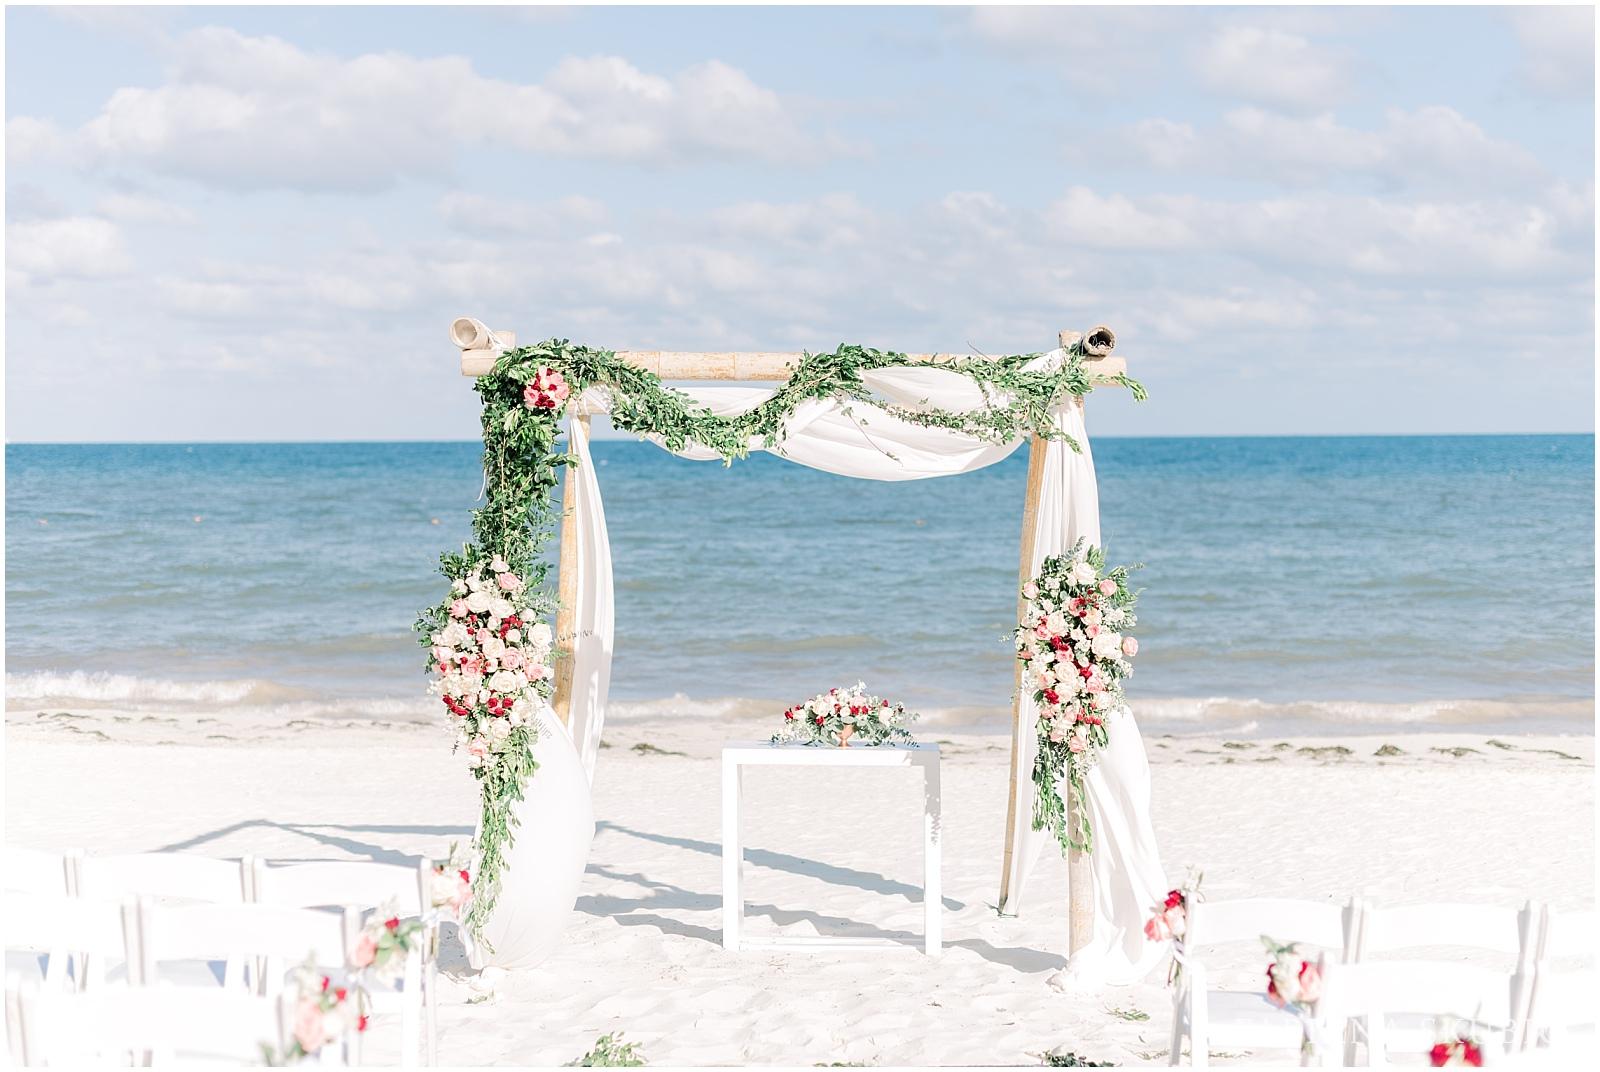 TJ_Now_Sapphire_Riviera_Cancun_Mexico_Wedding_Photos_0220.jpg